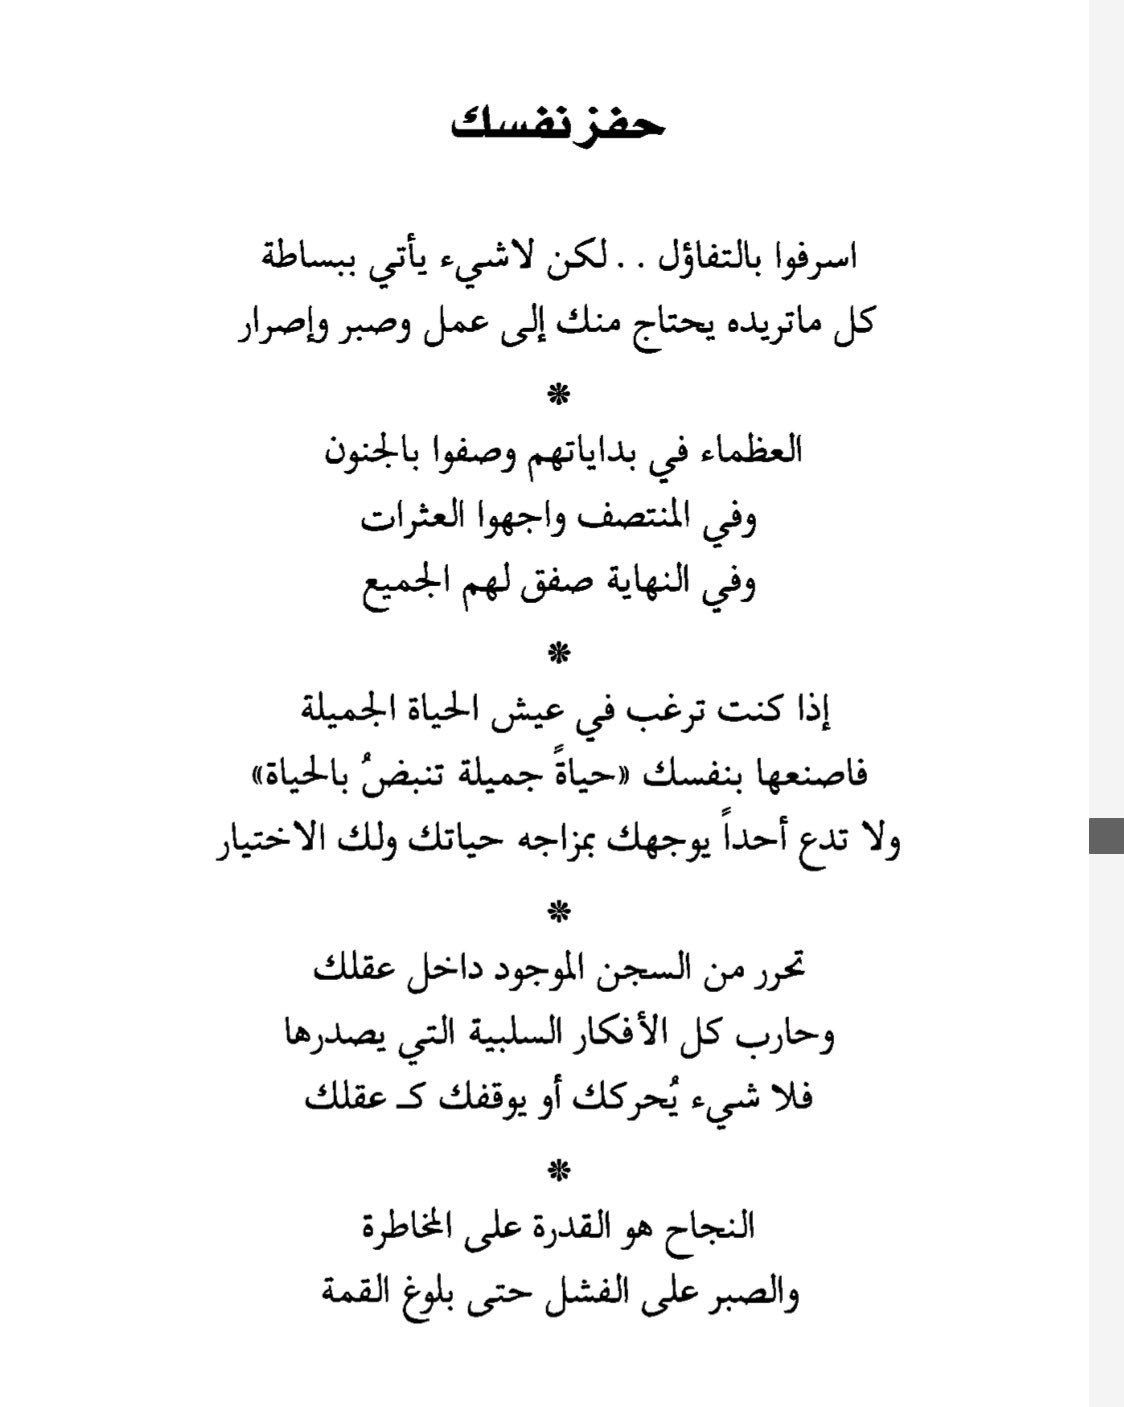 Pin by teacherAlanood on كتب قرأتها | Arabic quotes, Arabic